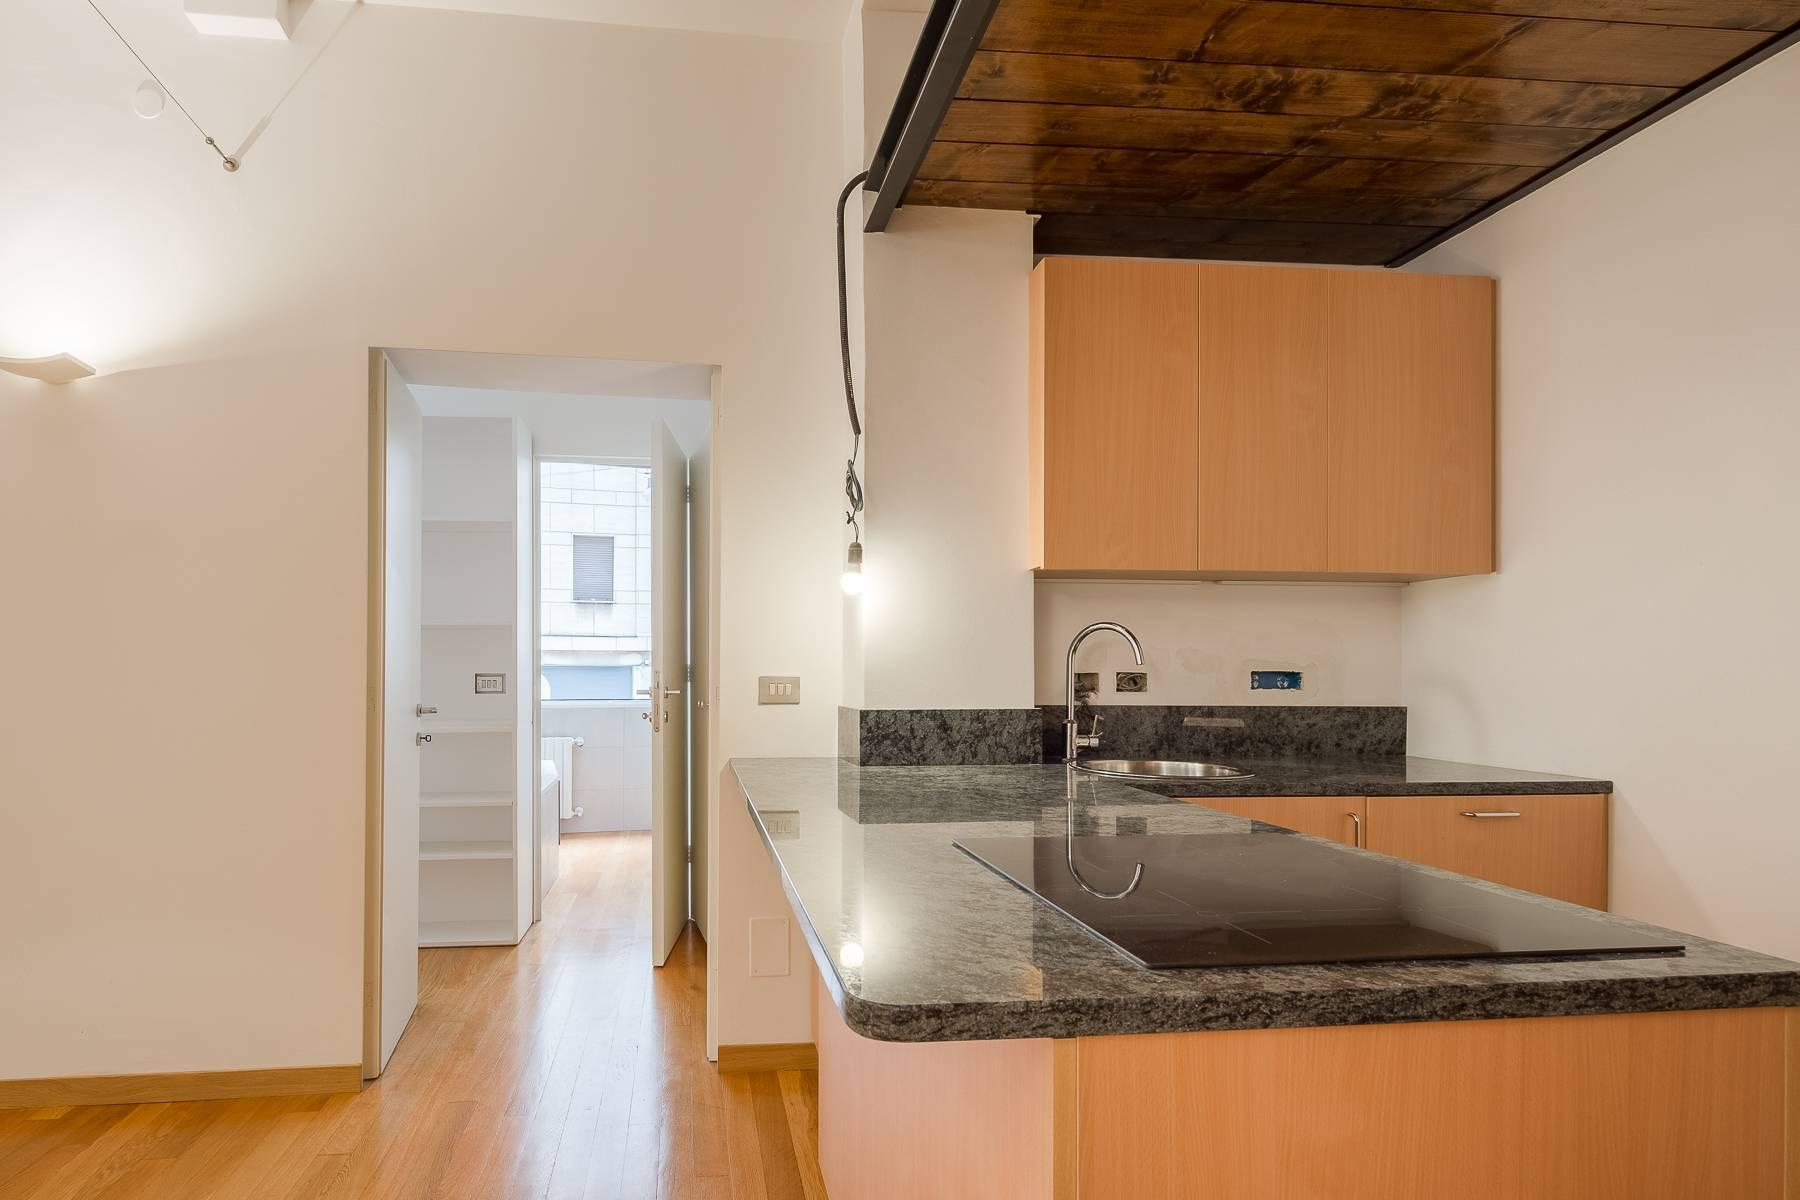 Apartment in an elegant period building located in a prestigious city district - 19